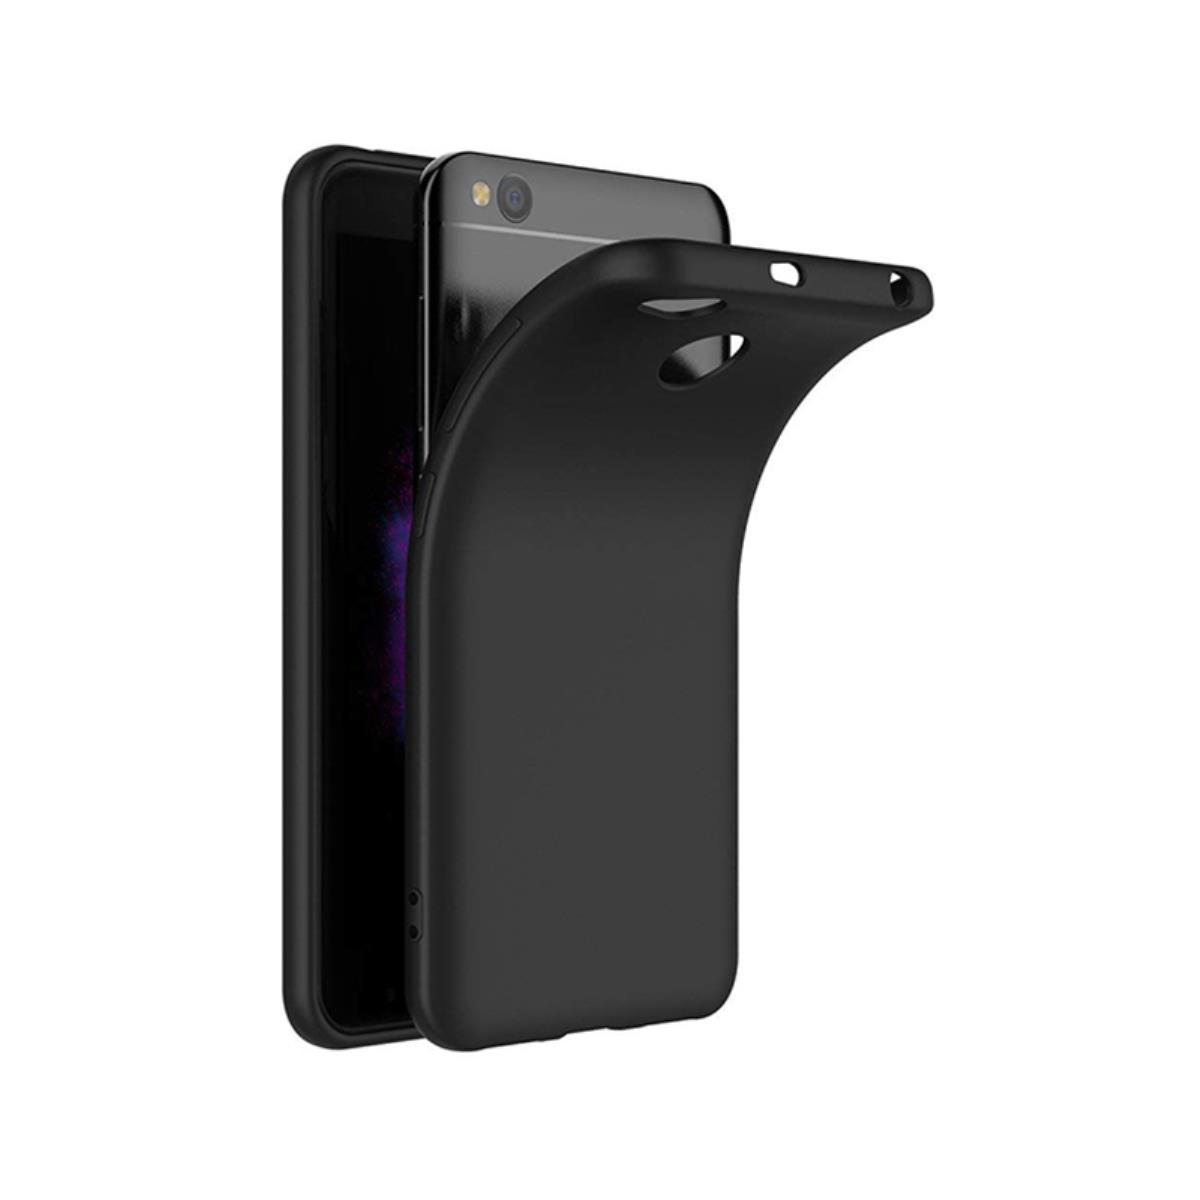 XIAOMI REDMI 5 DUAL SIM 16GB/2GB RAM LTE BLACK